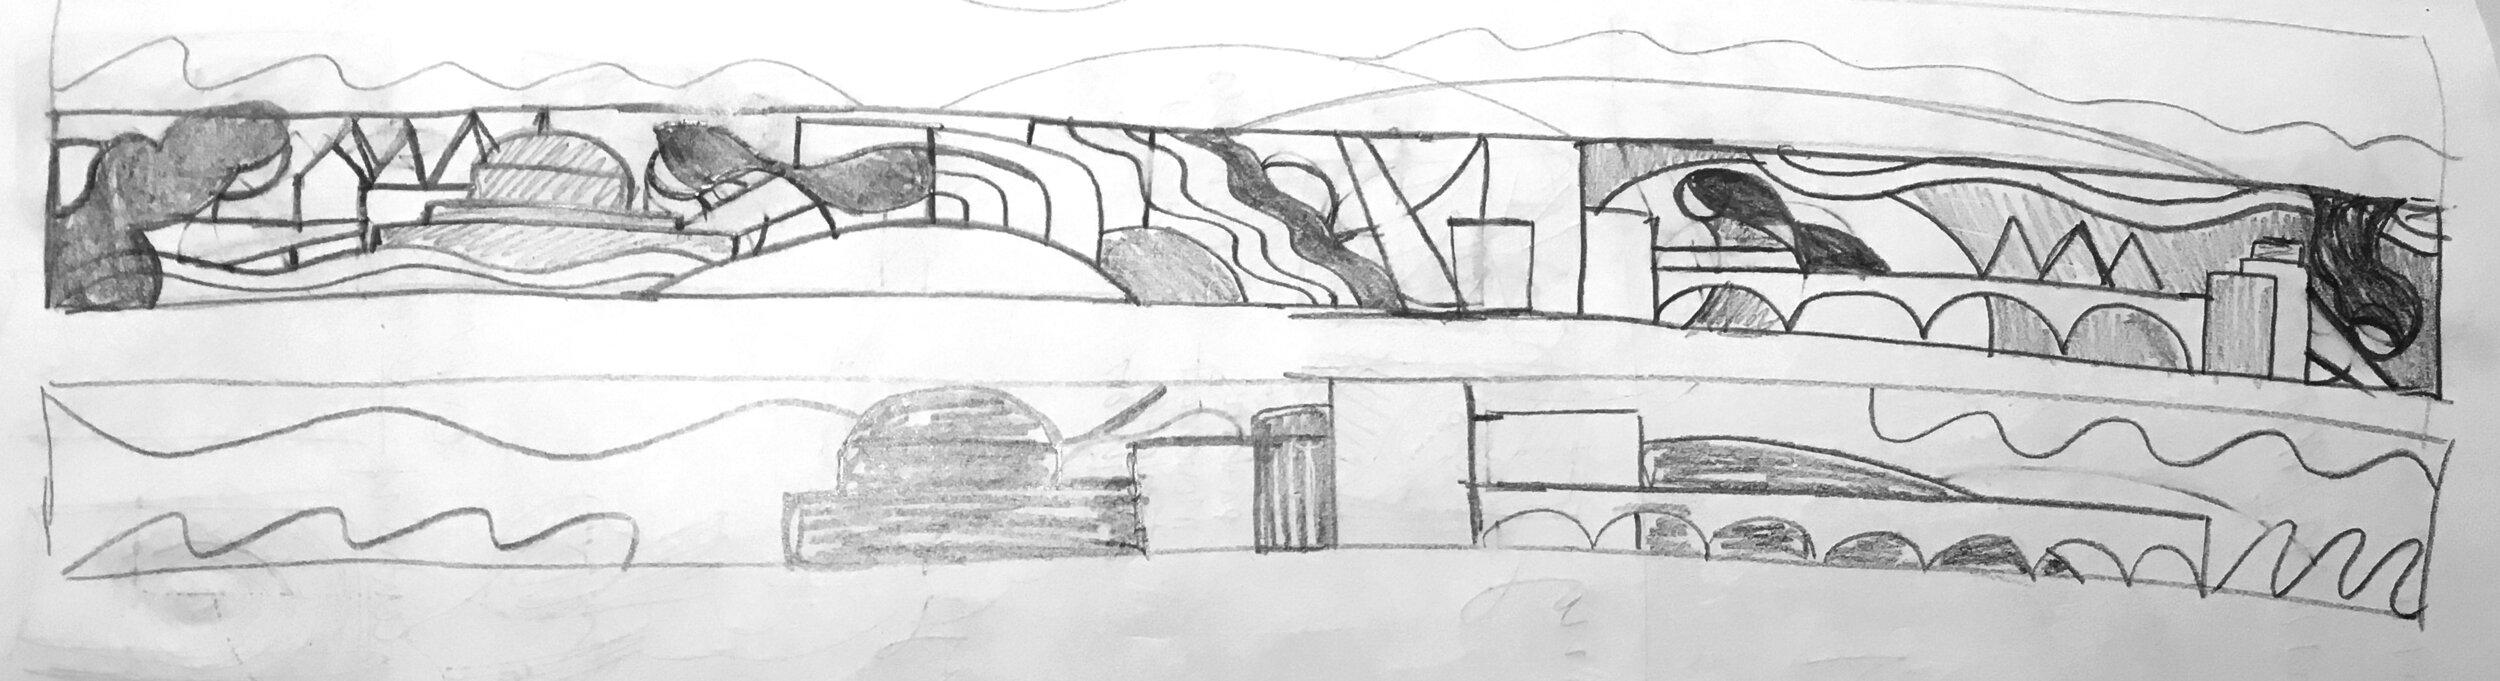 Initial sketch of flag stripe design